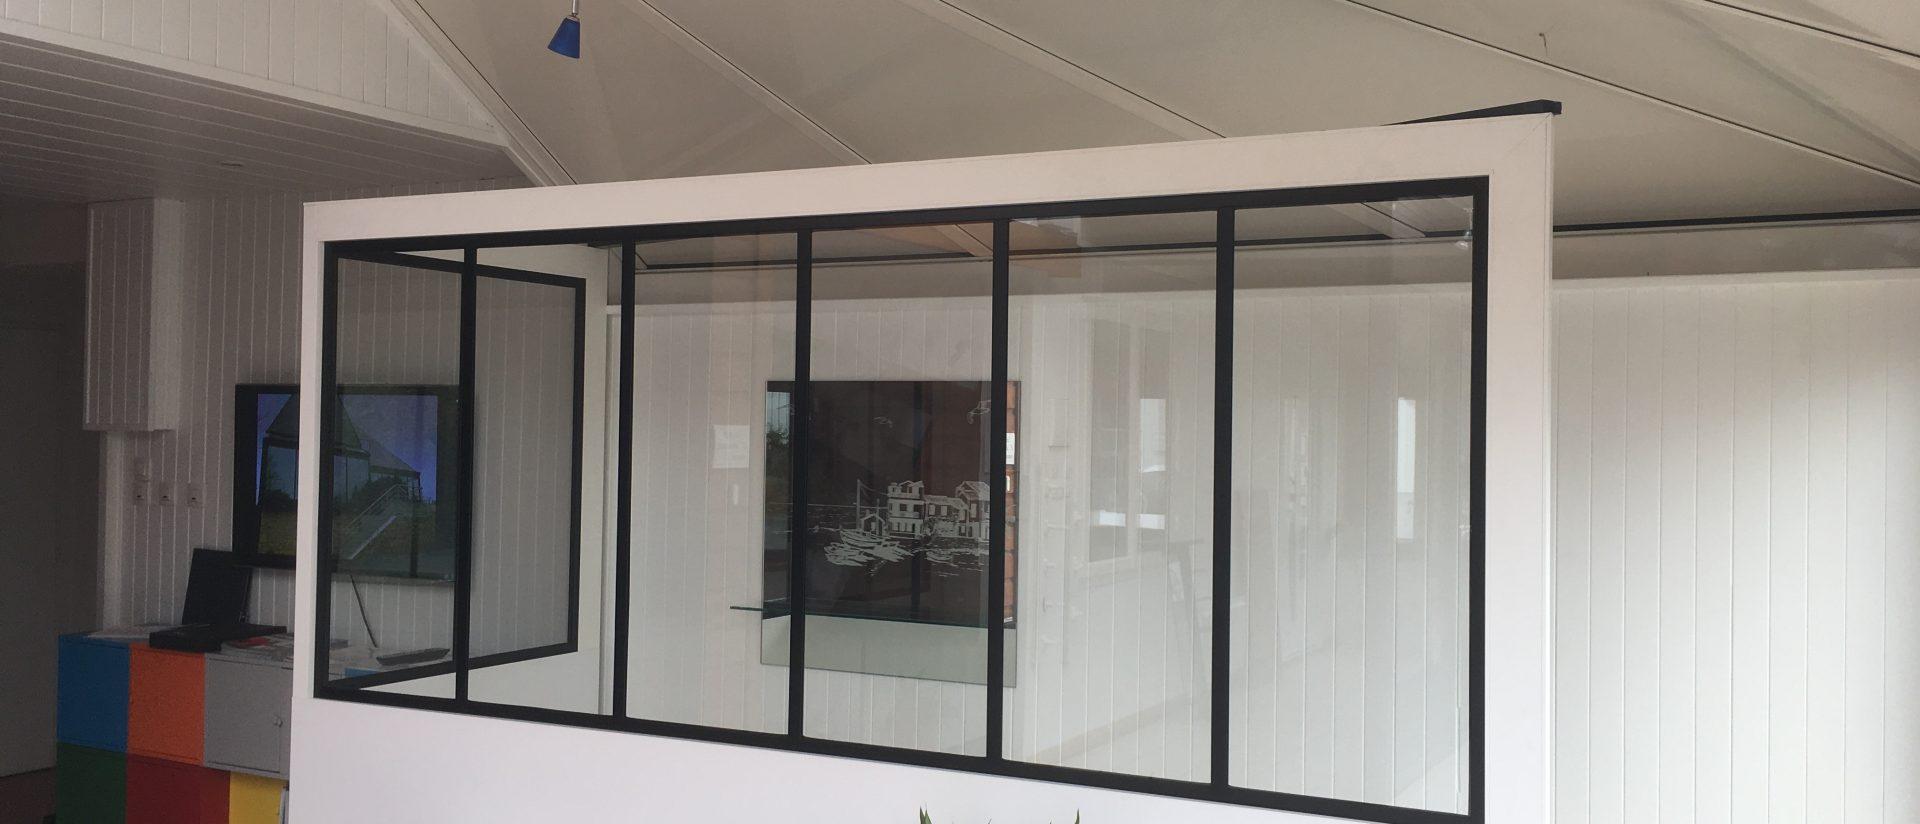 cloisons vitr es et verri res type atelier. Black Bedroom Furniture Sets. Home Design Ideas